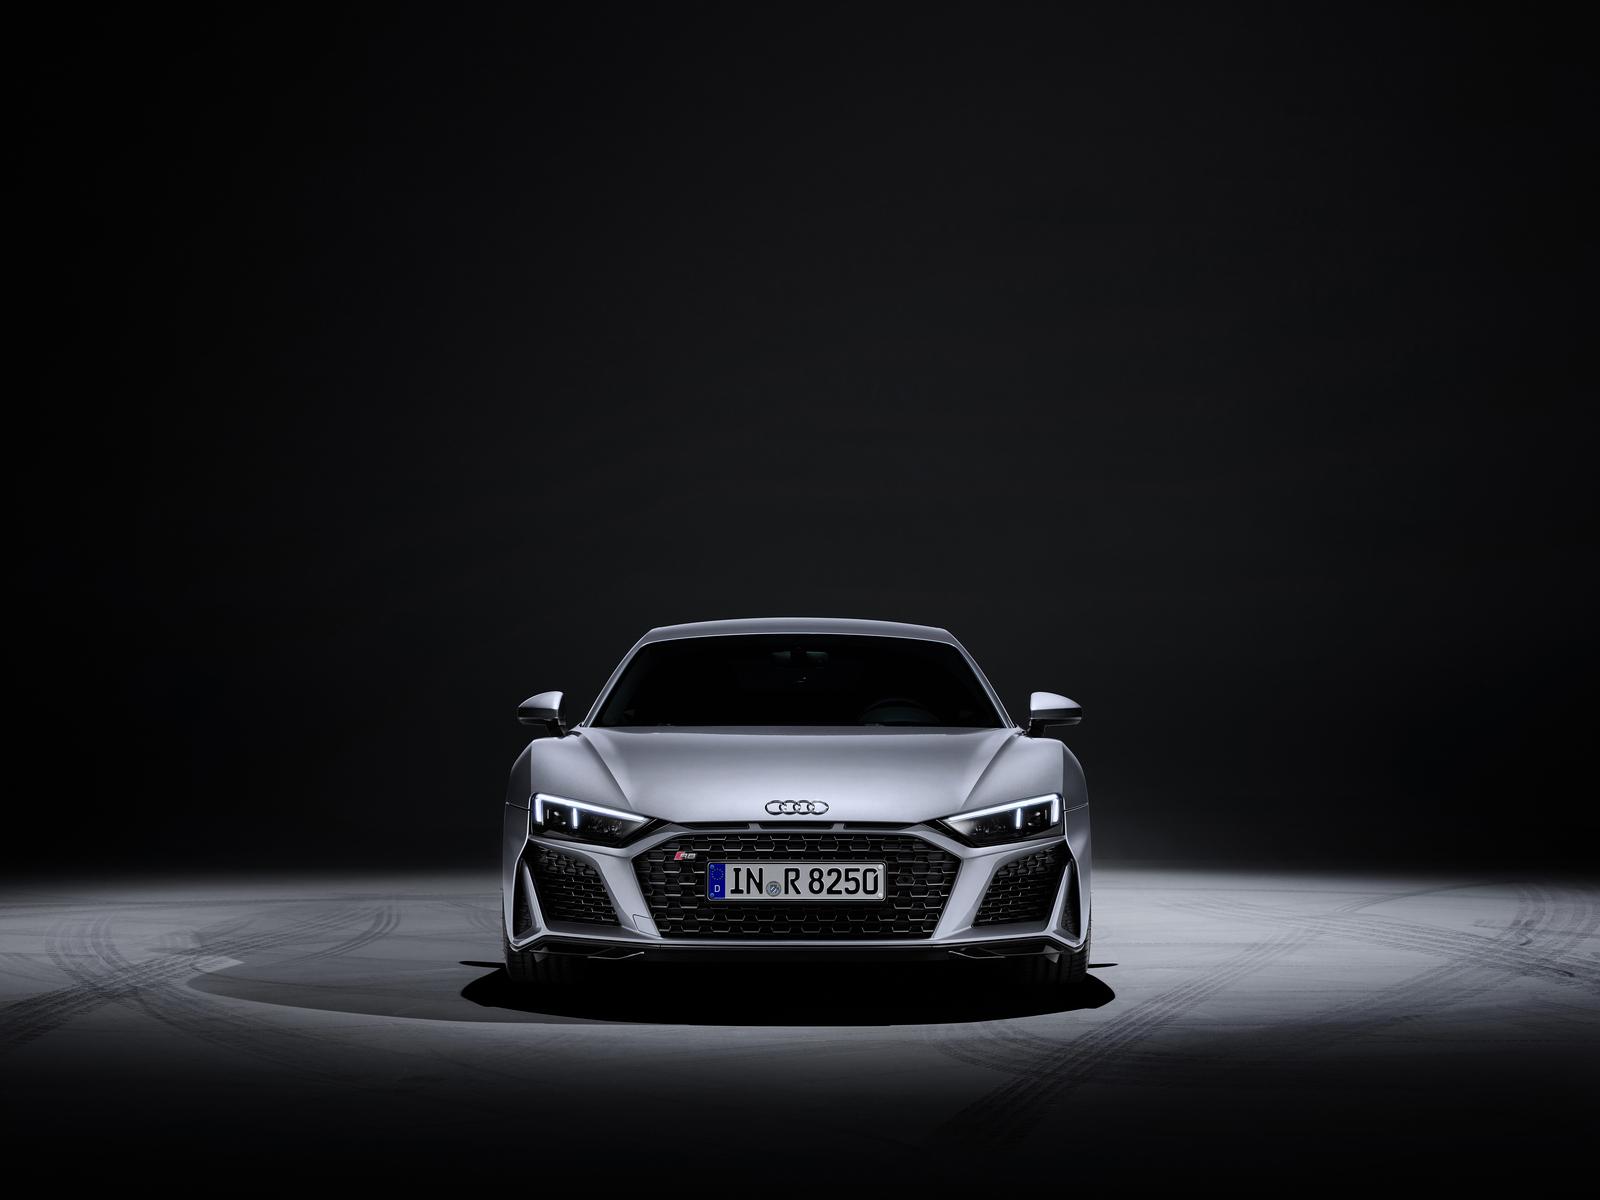 audi-r8-v10-rwd-coupe-2019-ag.jpg